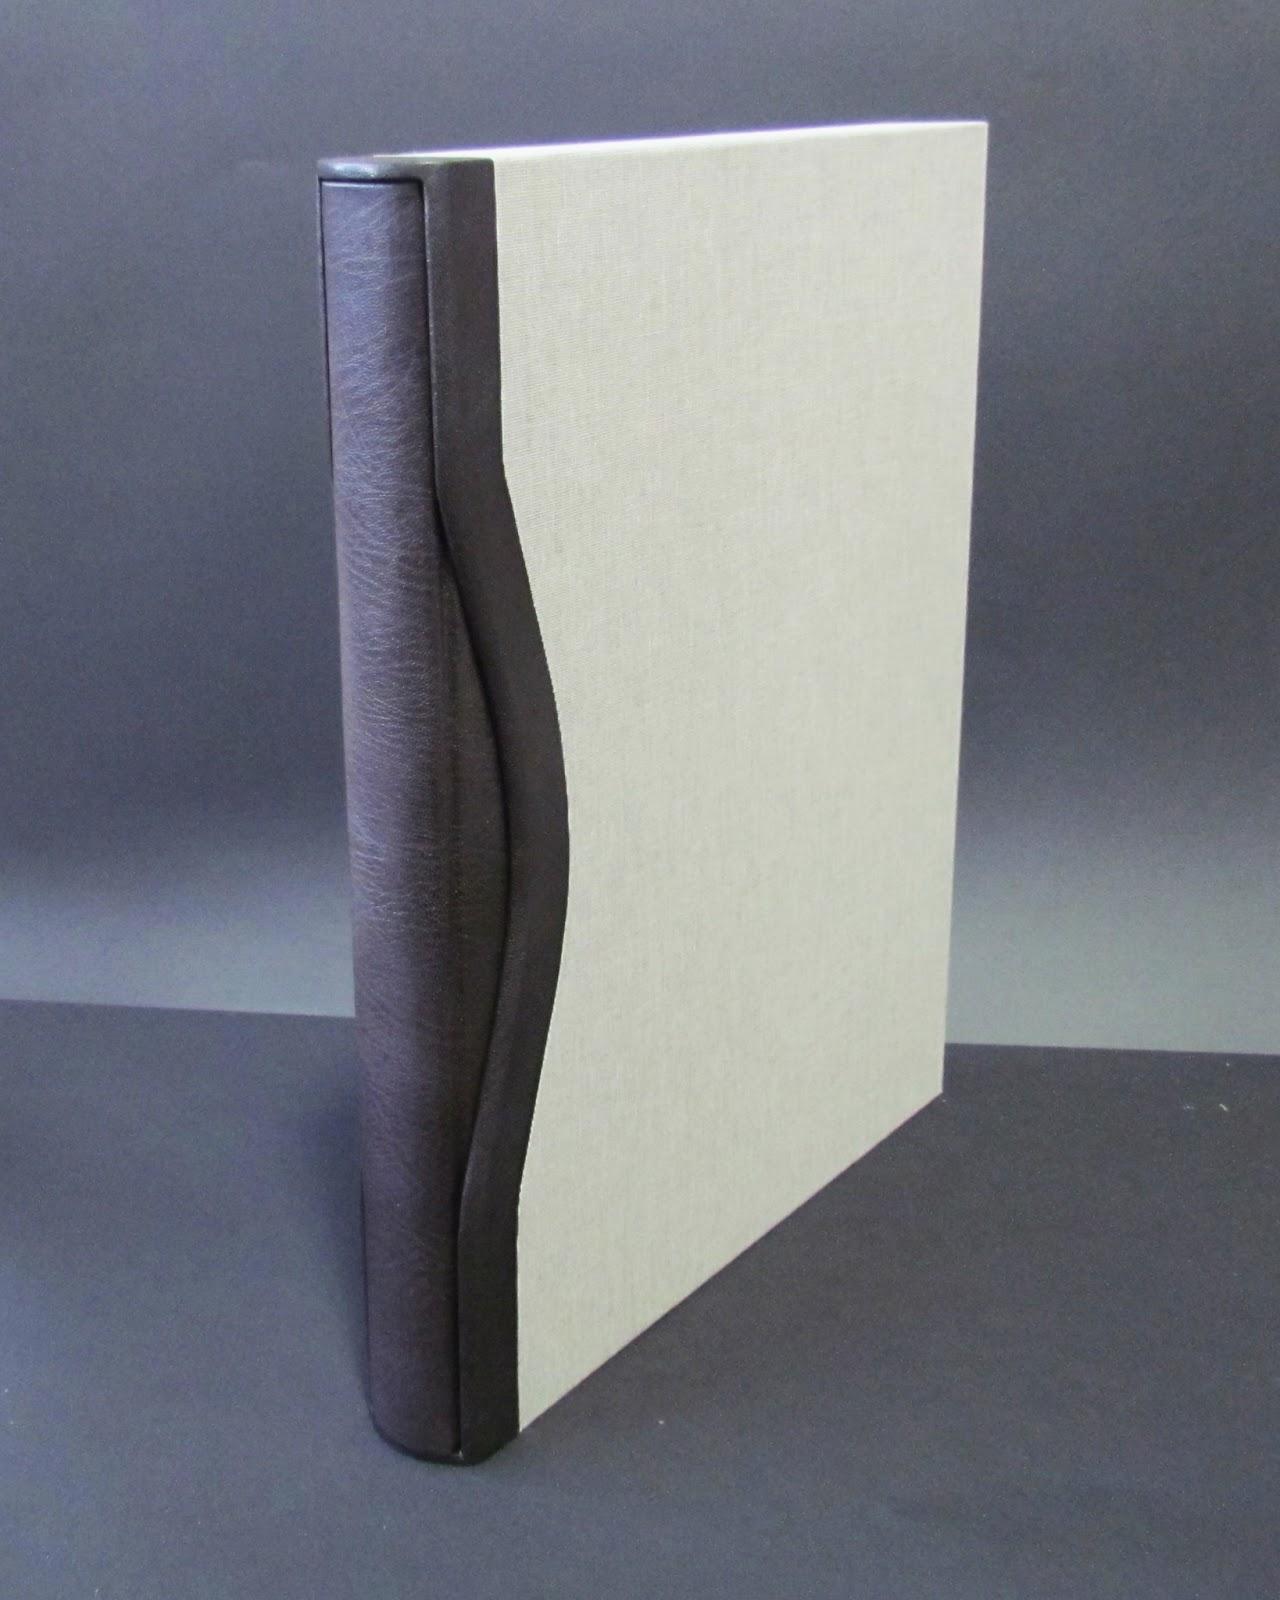 http://3.bp.blogspot.com/-vkIkF_cKPR8/UU0sAj2sDHI/AAAAAAAABRQ/dlo29z0S_H0/s1600/seder+book+and+slipcase+1.jpg